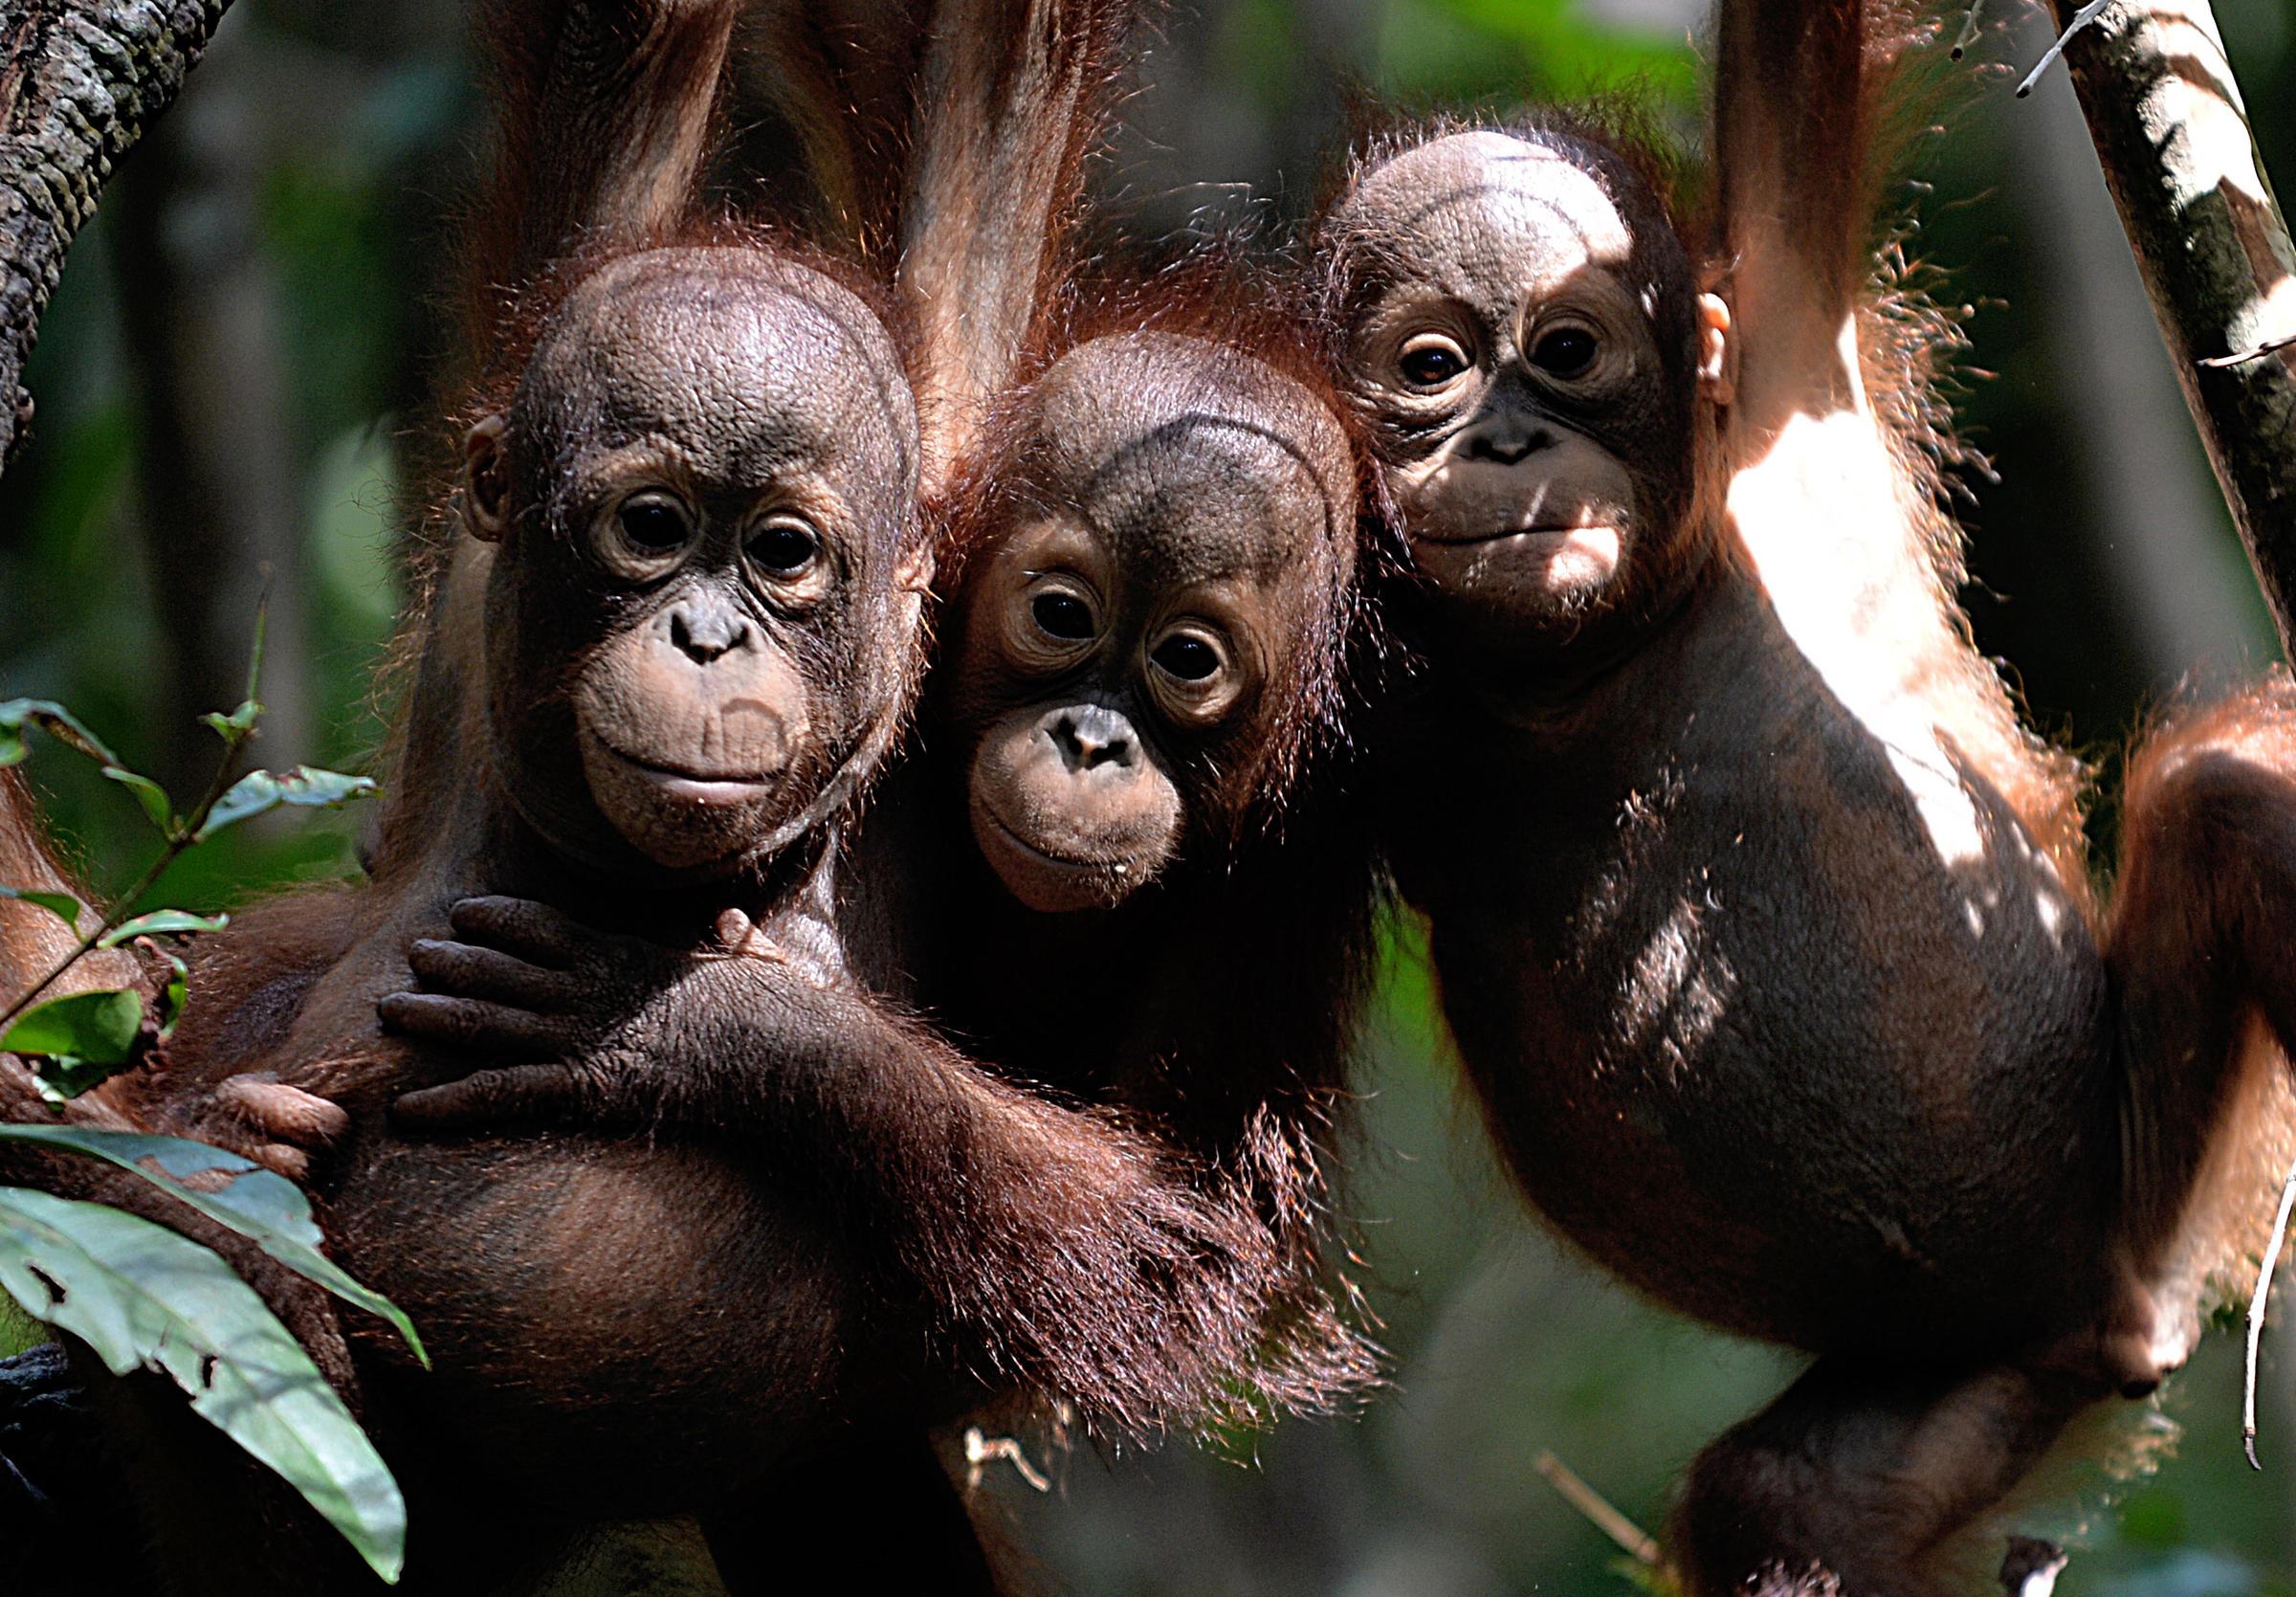 Borneo's Orangutan Population Declines By 100000 in 16 Years